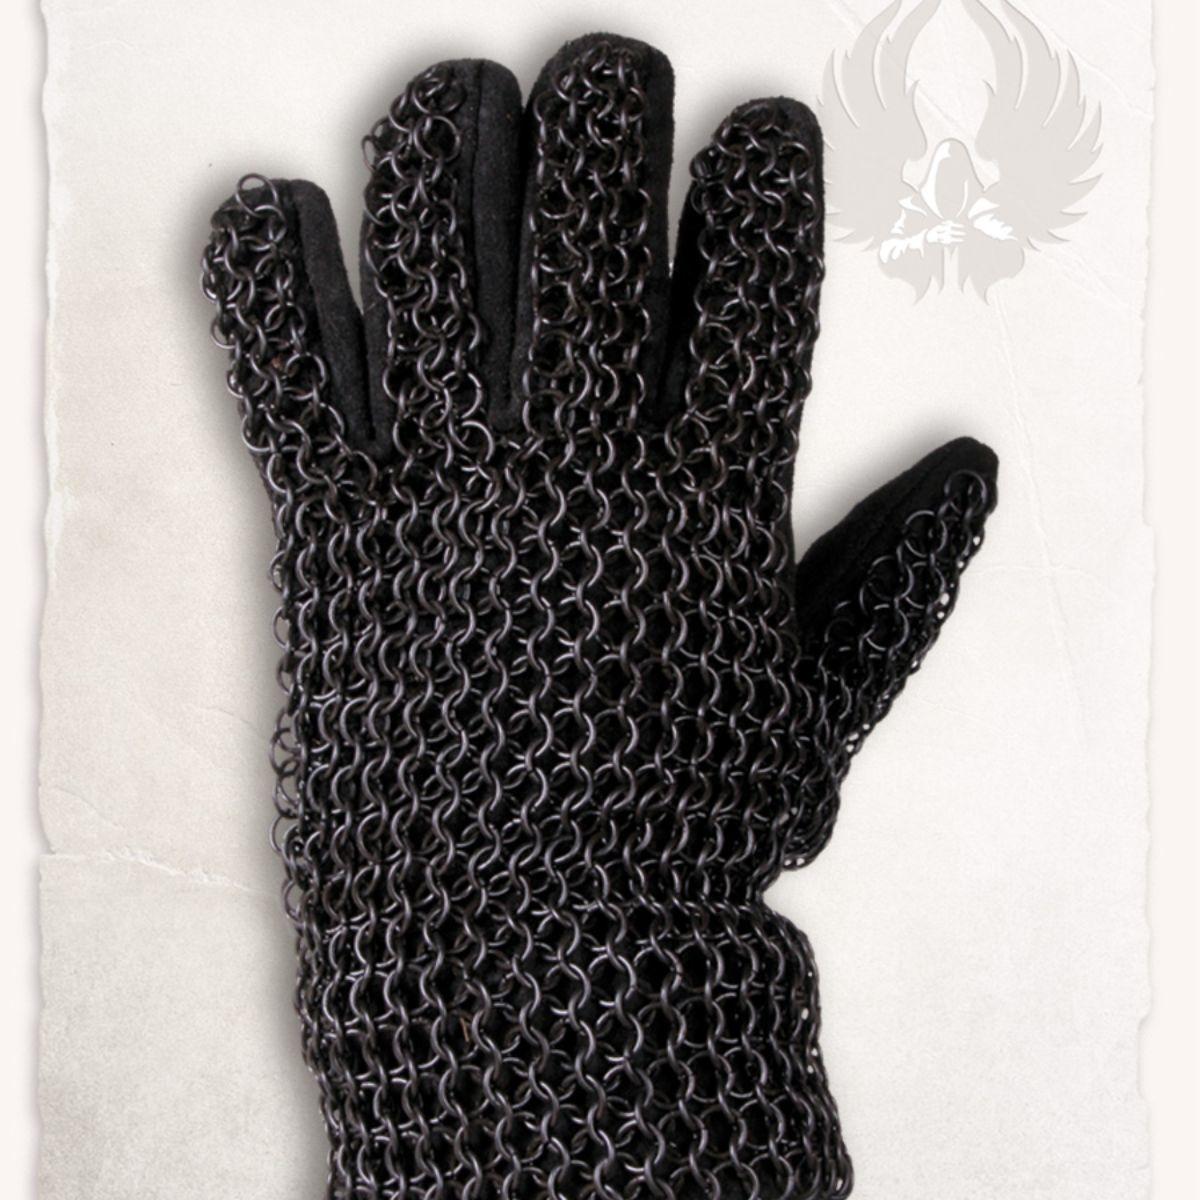 Maliënhandschoenen Richard, gebronsd